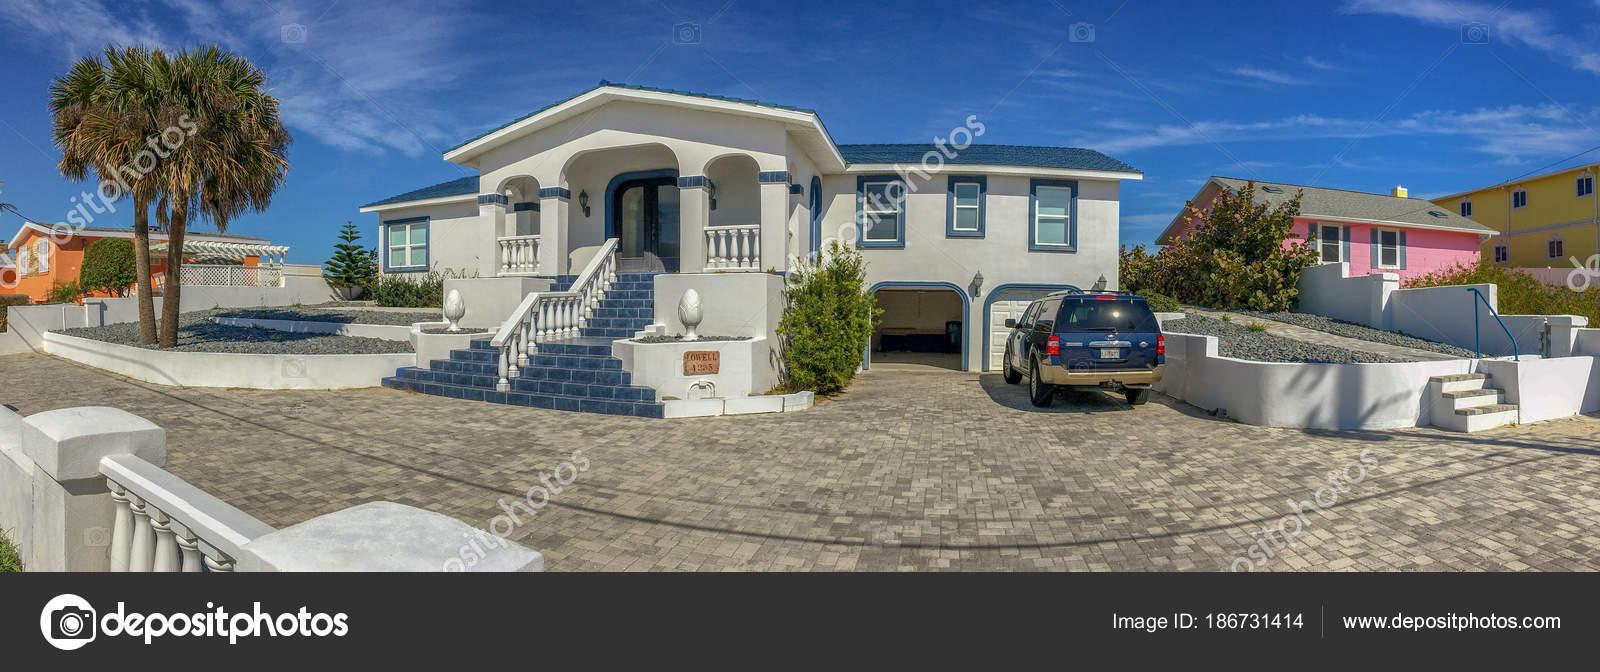 Daytona beach febrero 2016 hermosas casas junto mar for Casas modernas junto al mar